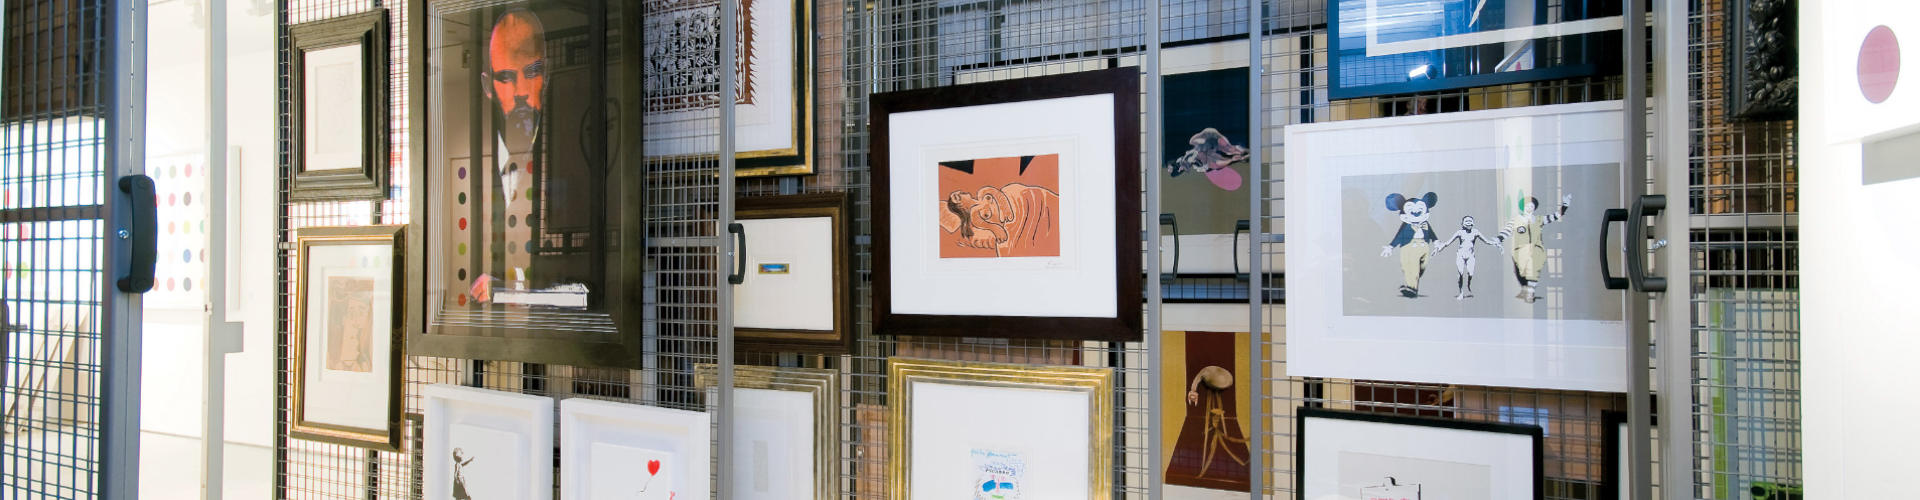 Art Gallery Mezzanine Floors